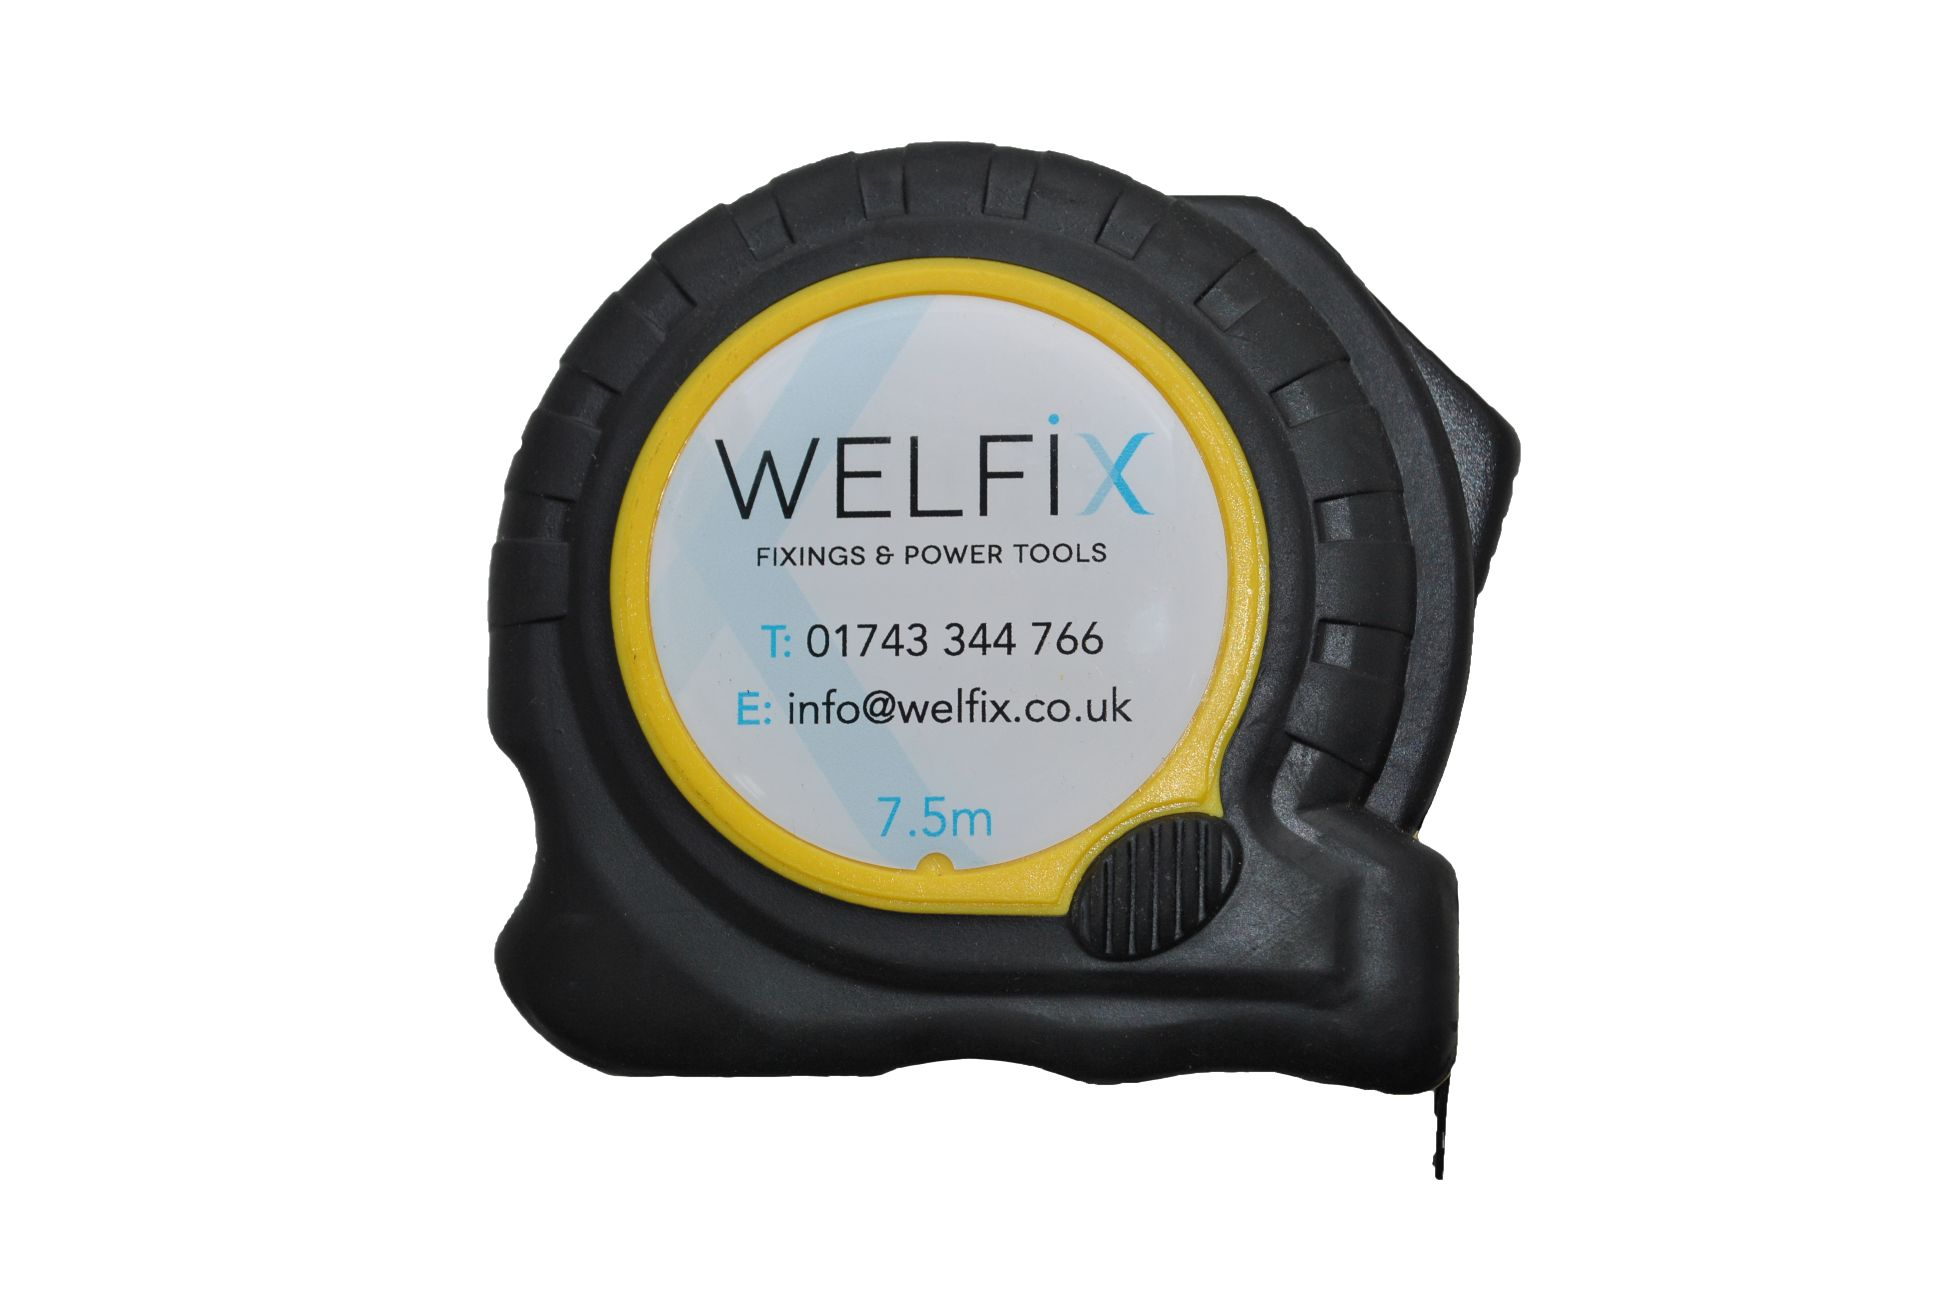 'WELFIX' TAPE MEASURE - 10M/33FT